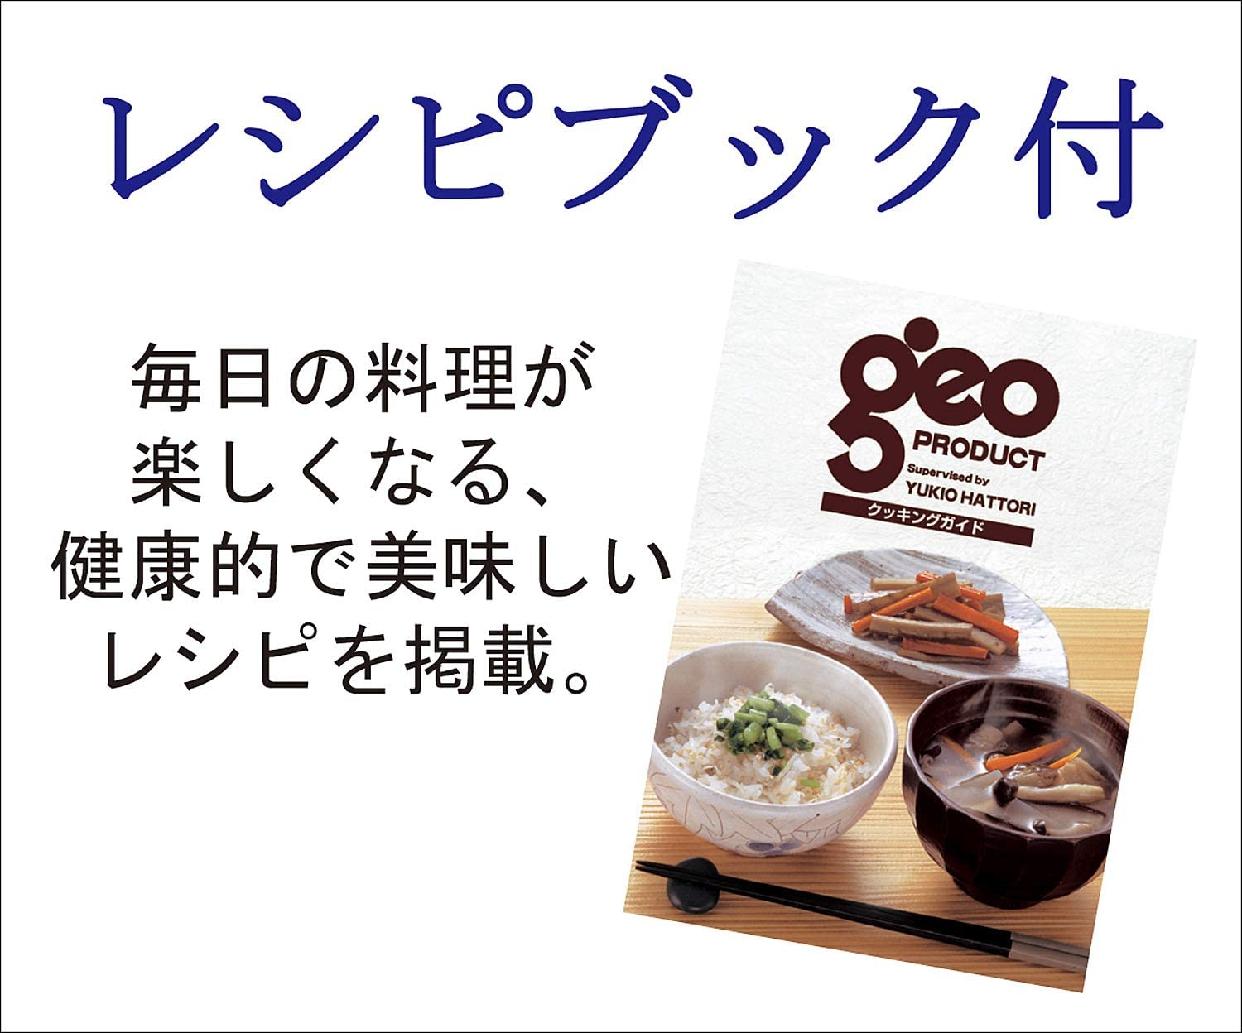 GEO Product(ジオ・プロダクト) 浅型両手鍋 22cm GEO-22Sの商品画像8